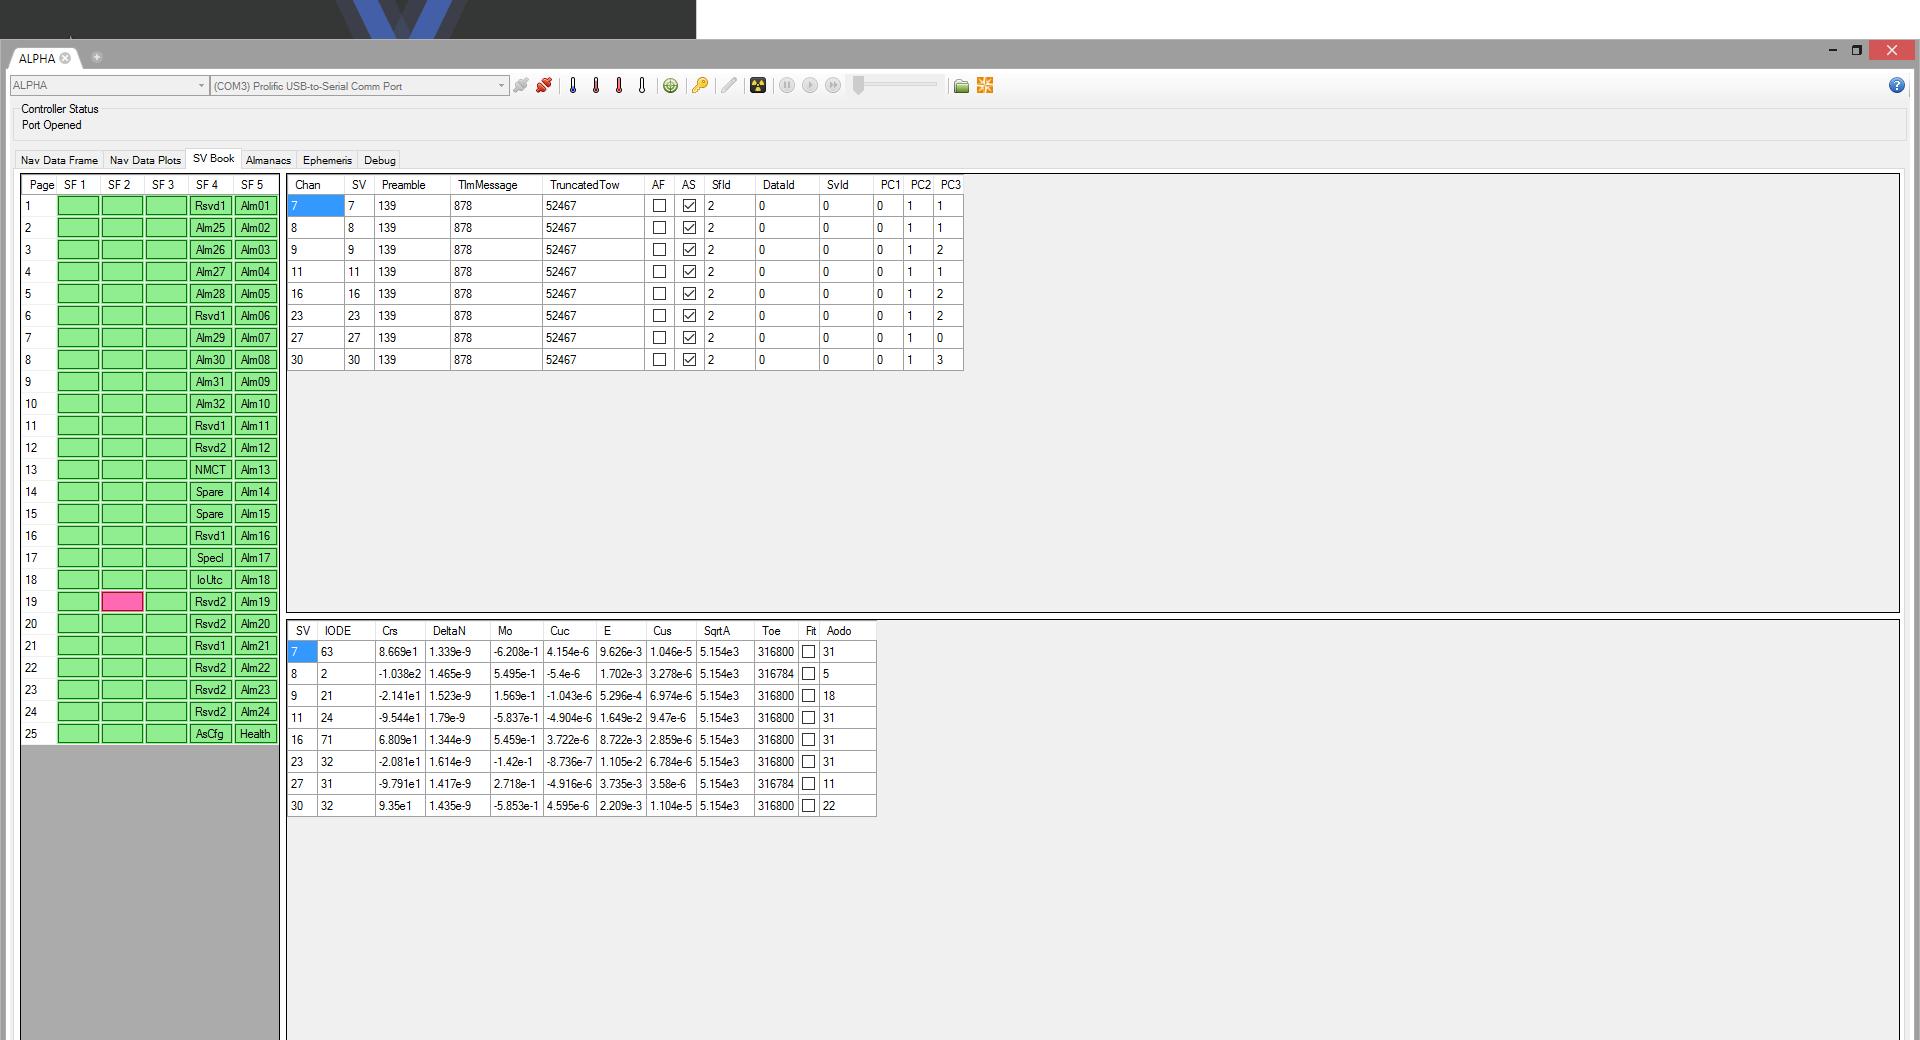 RxStudio_SVBook_FULL_Shot_Javad